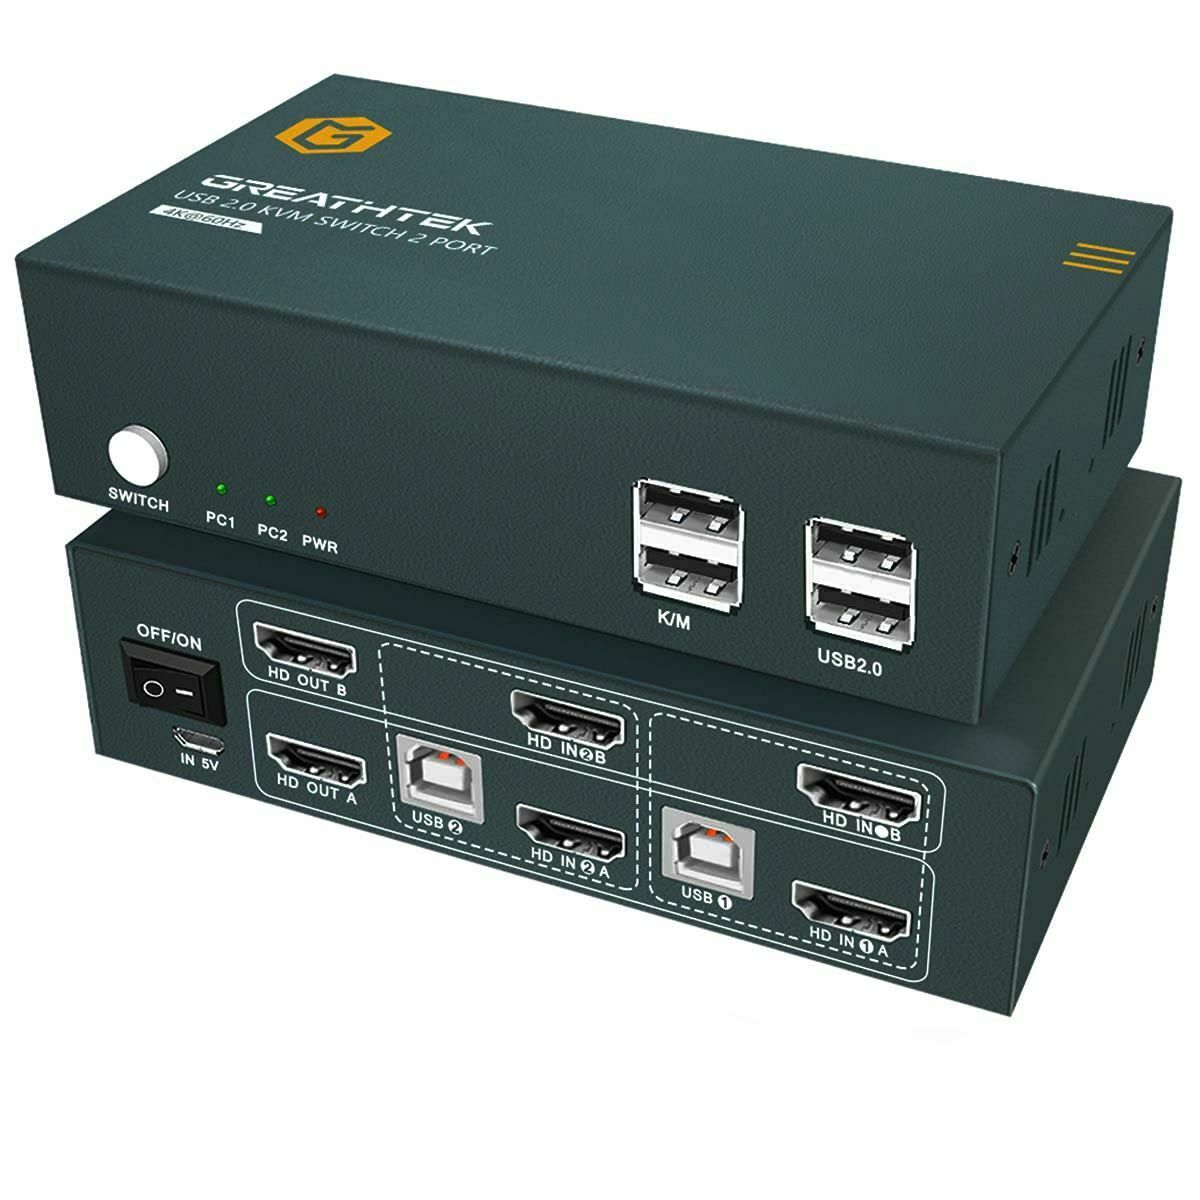 HDMI 2.0 KVM Switch Dual Monitor 2 Port 4K, 4K @ 60Hz, USB 2.0, 2 PC 2 Monitor